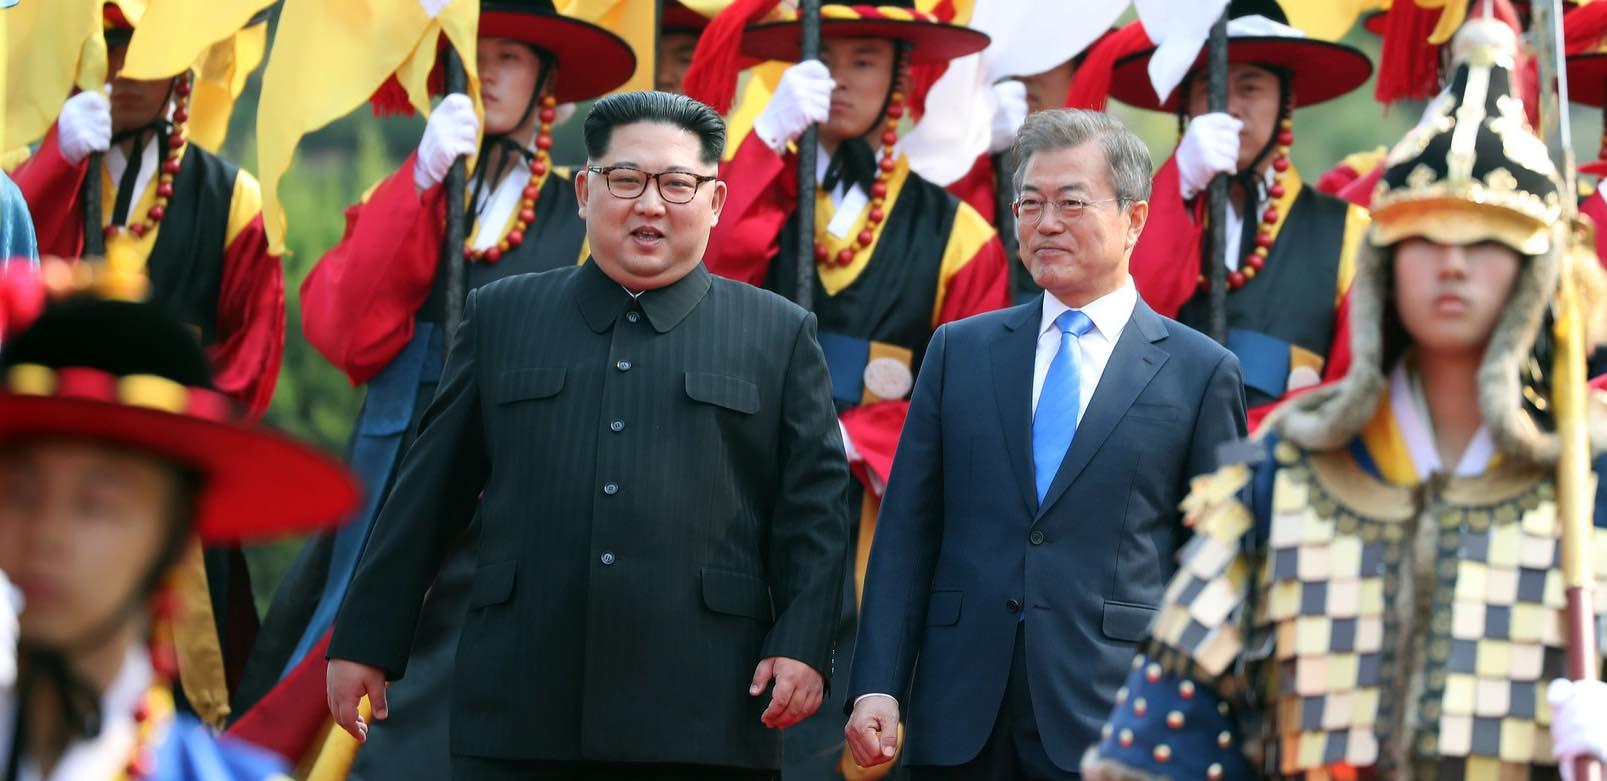 Photo: Republic of Korea/Flickr